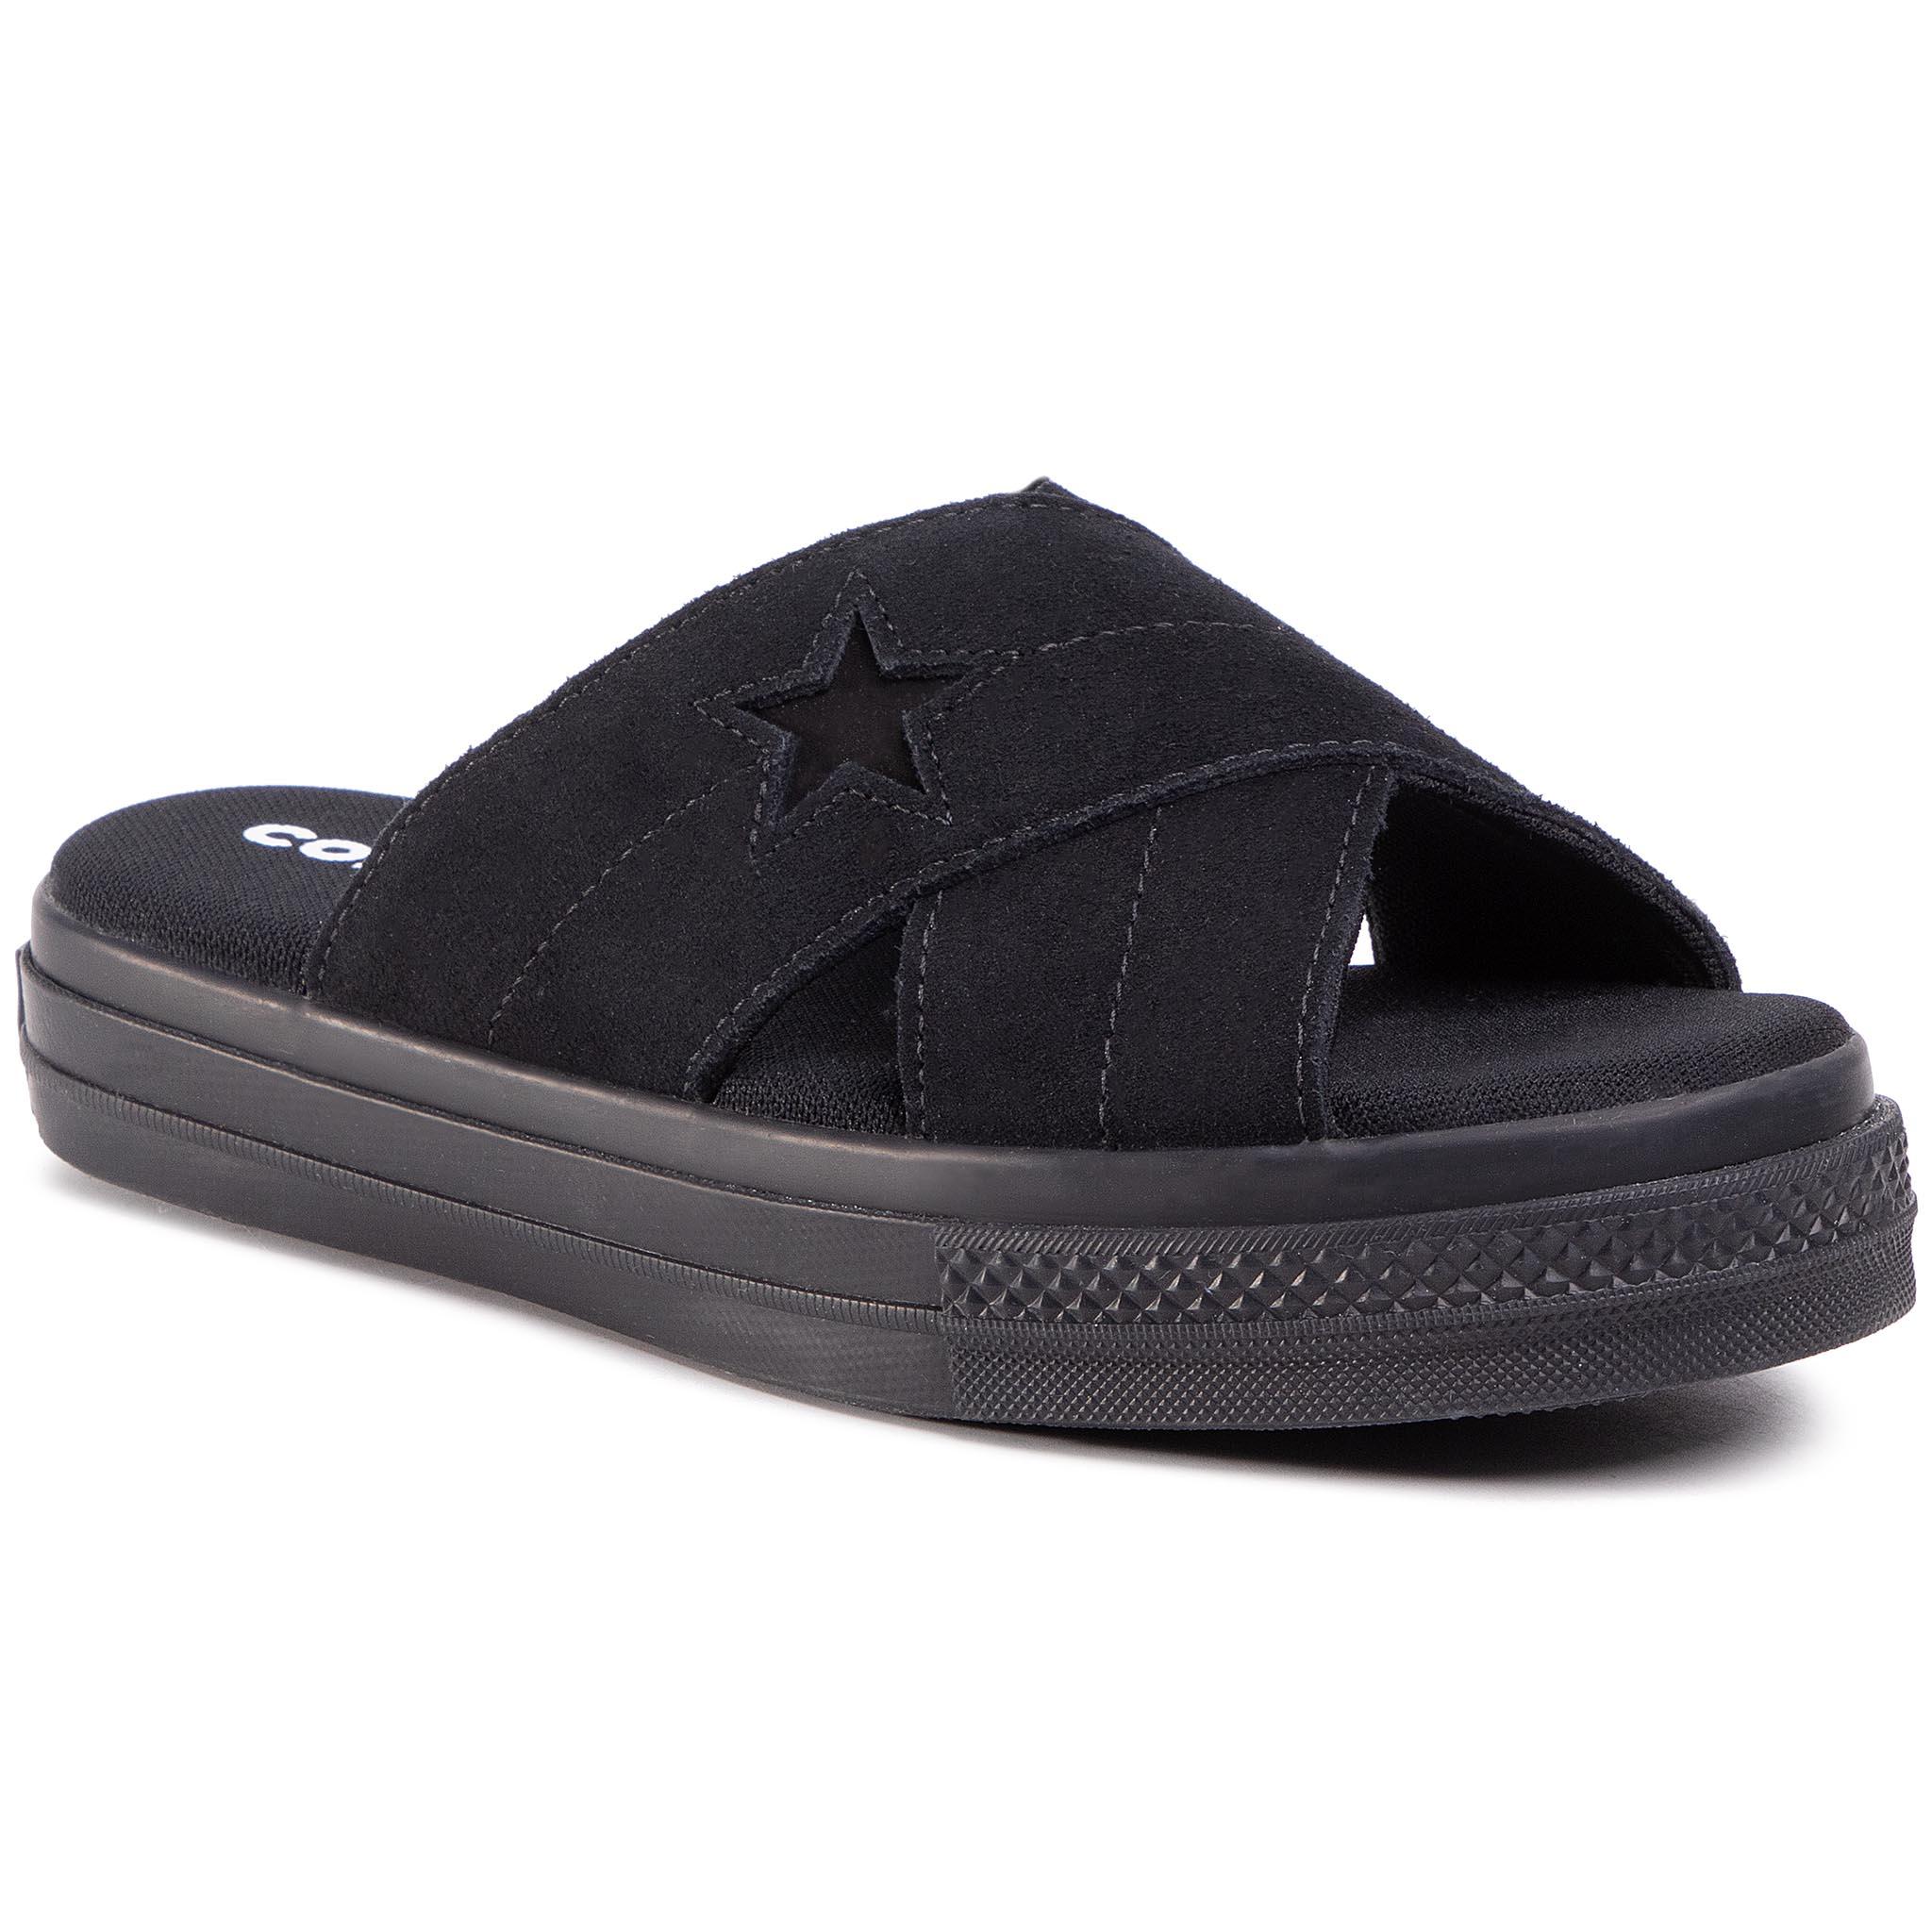 Image of Ciabatte CONVERSE - One Star Sandal Slip 564149C Black/Black/Black